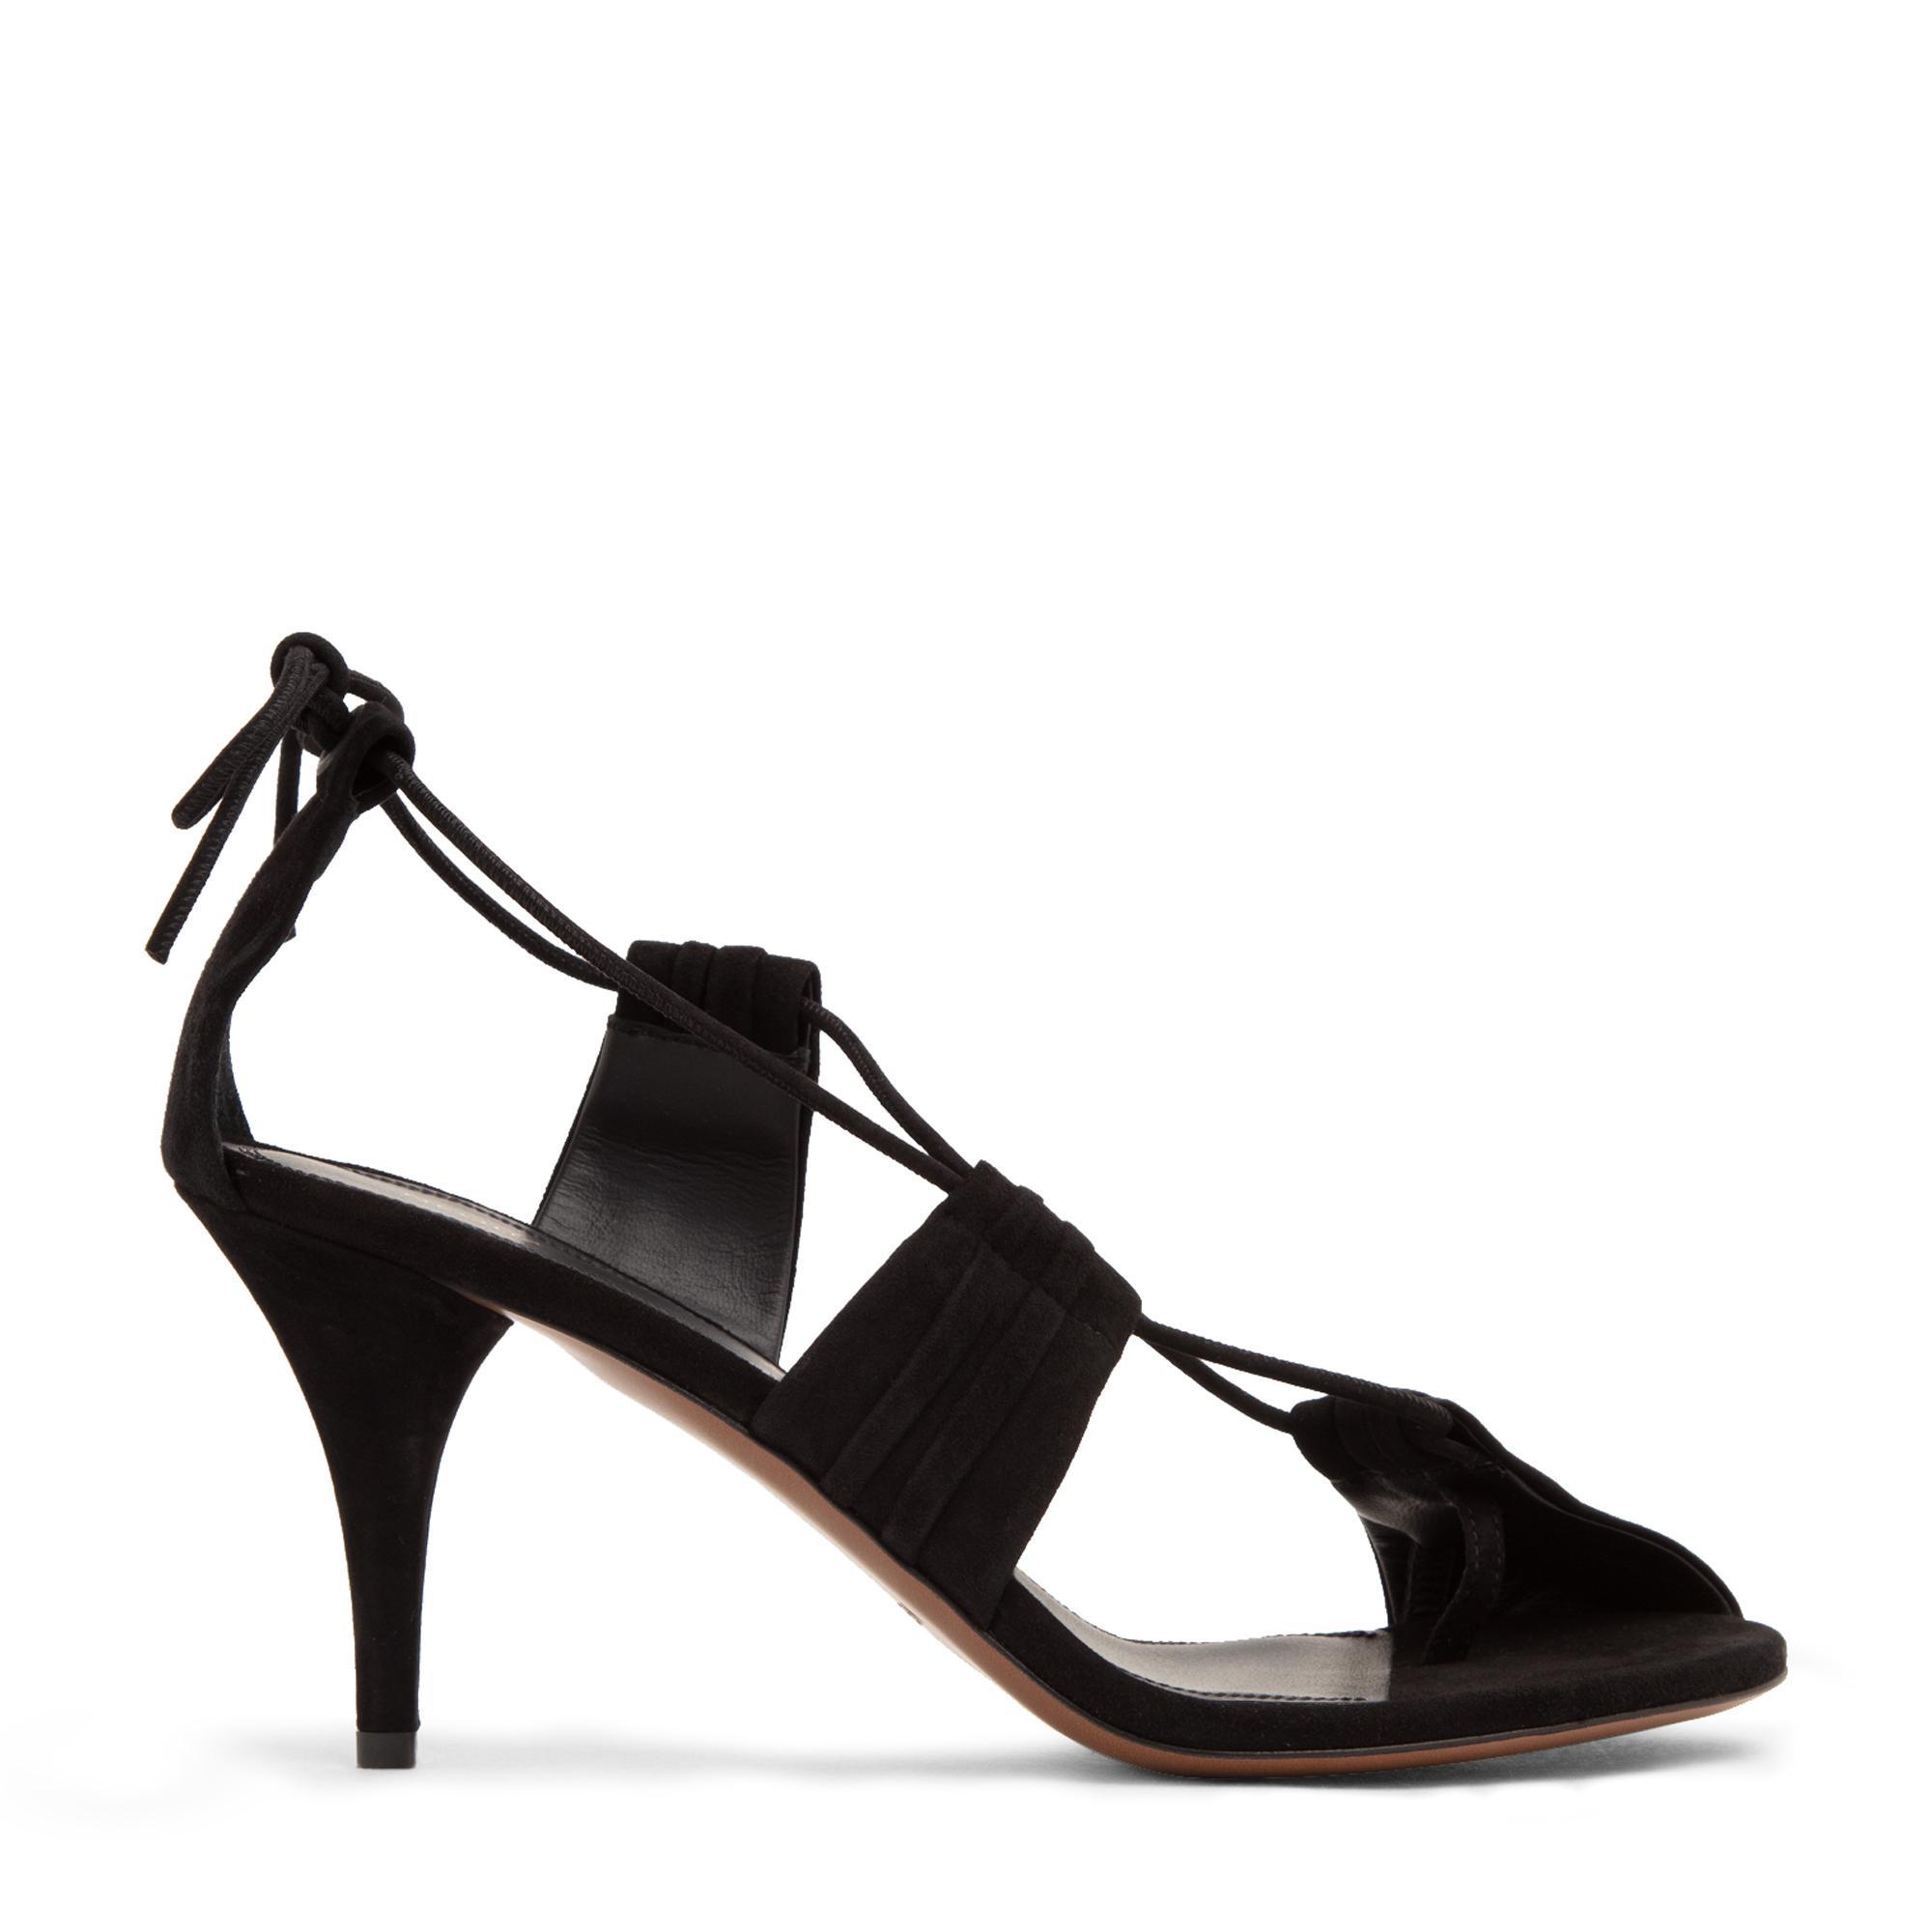 Giena suede sandals